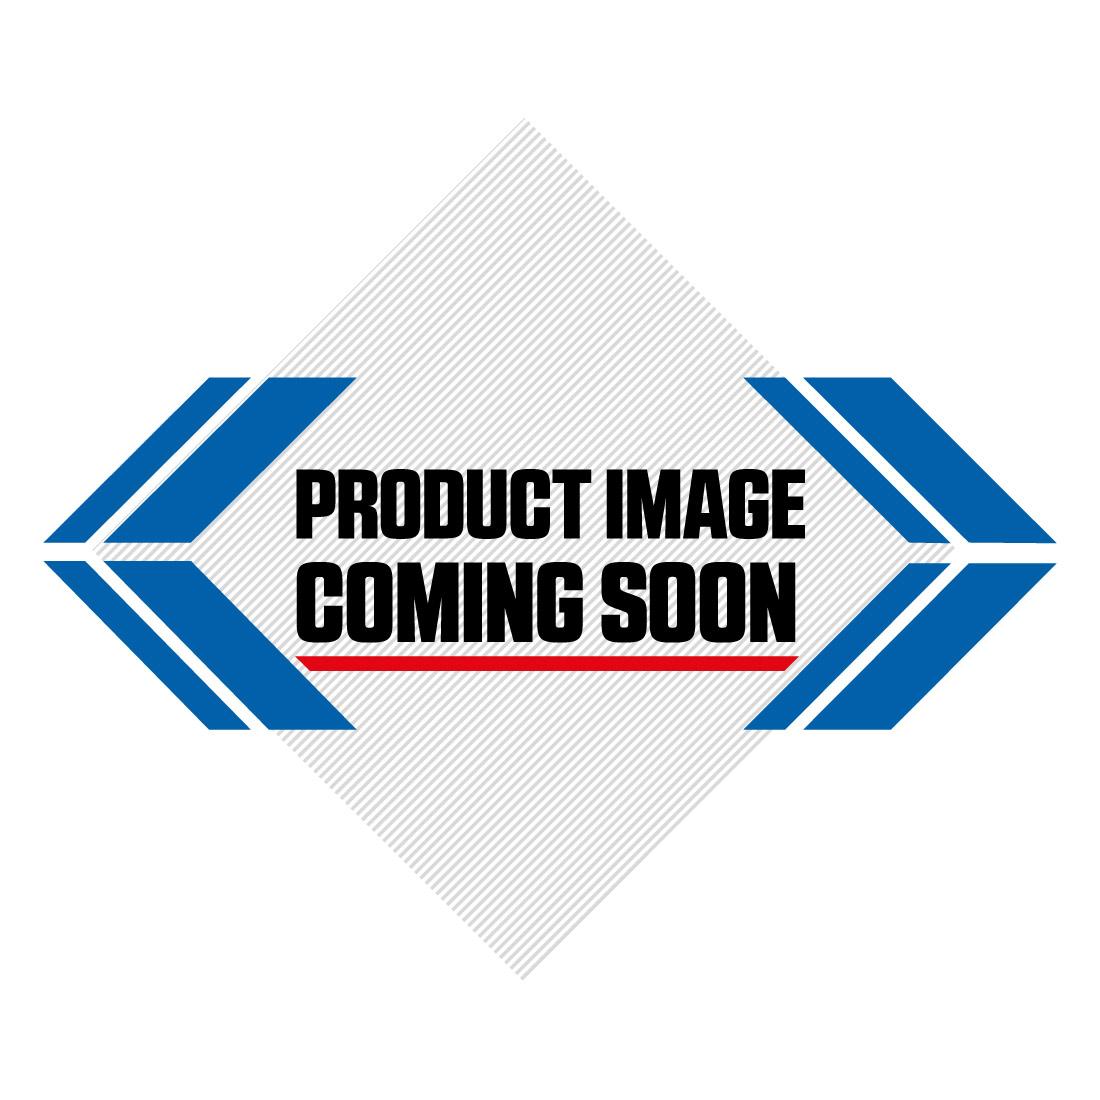 DJI Mavic 2 Pro Drone Image-2